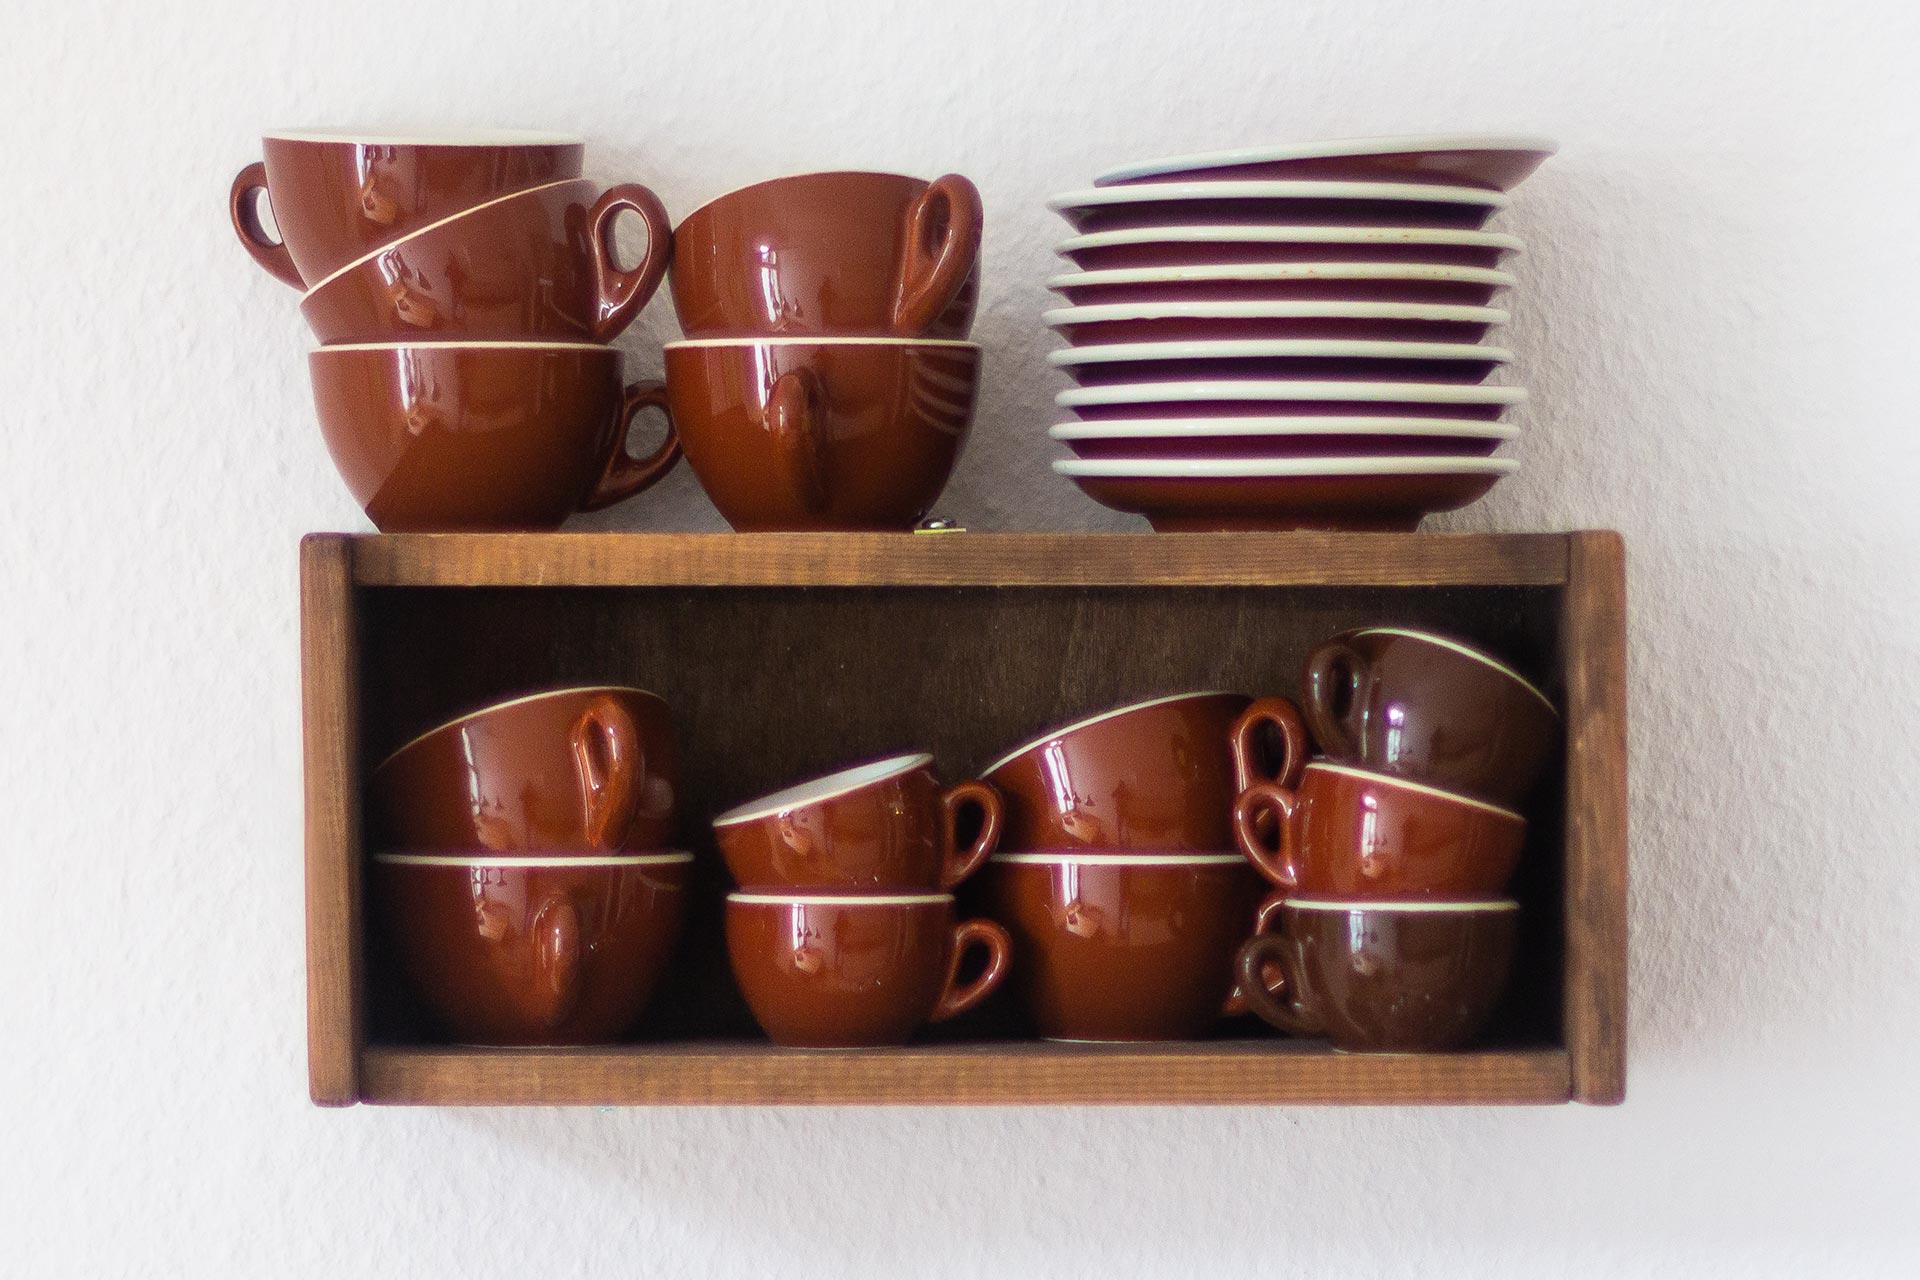 Your coffee corner. Deine Kaffee-Ecke.